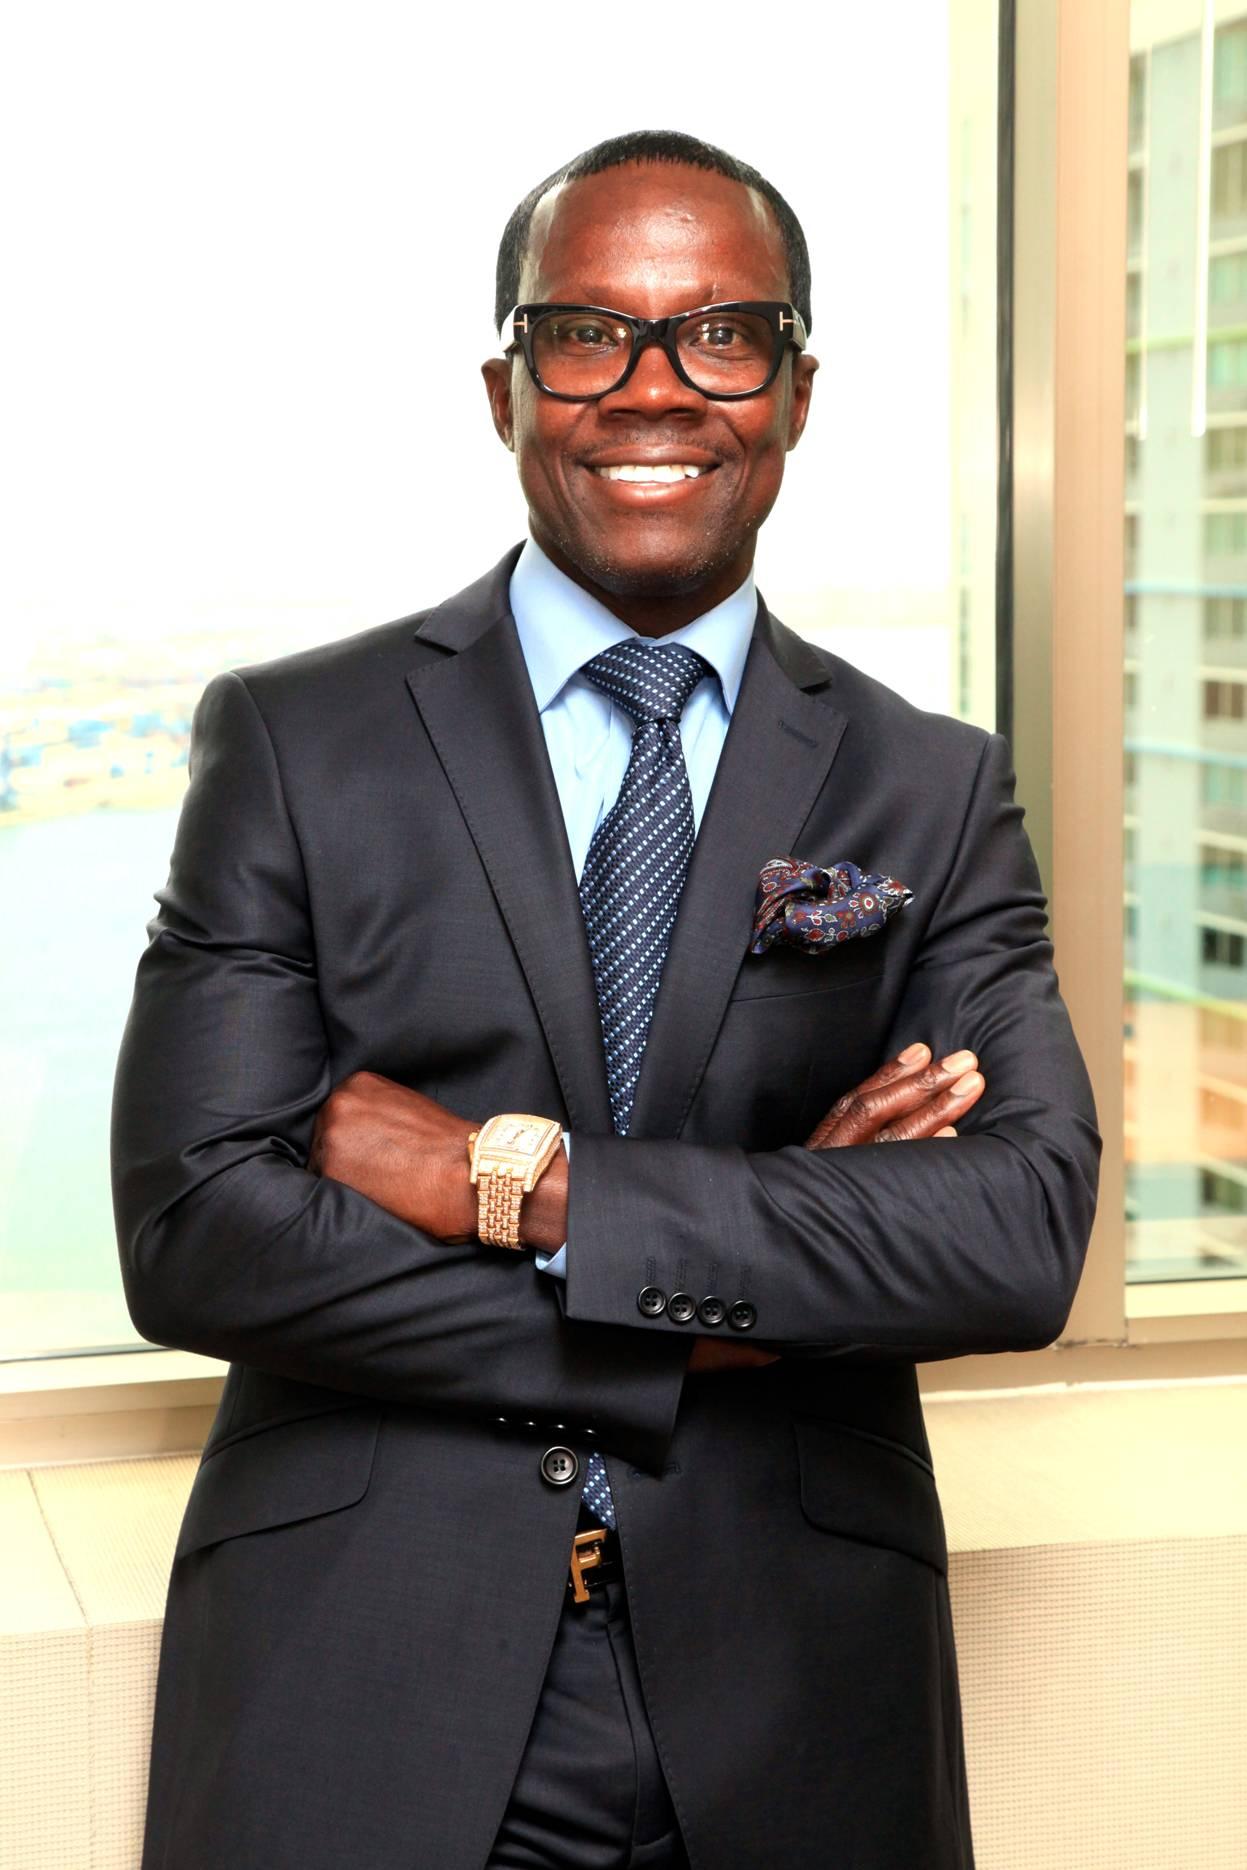 Black Executives Activ Doctors Online C...